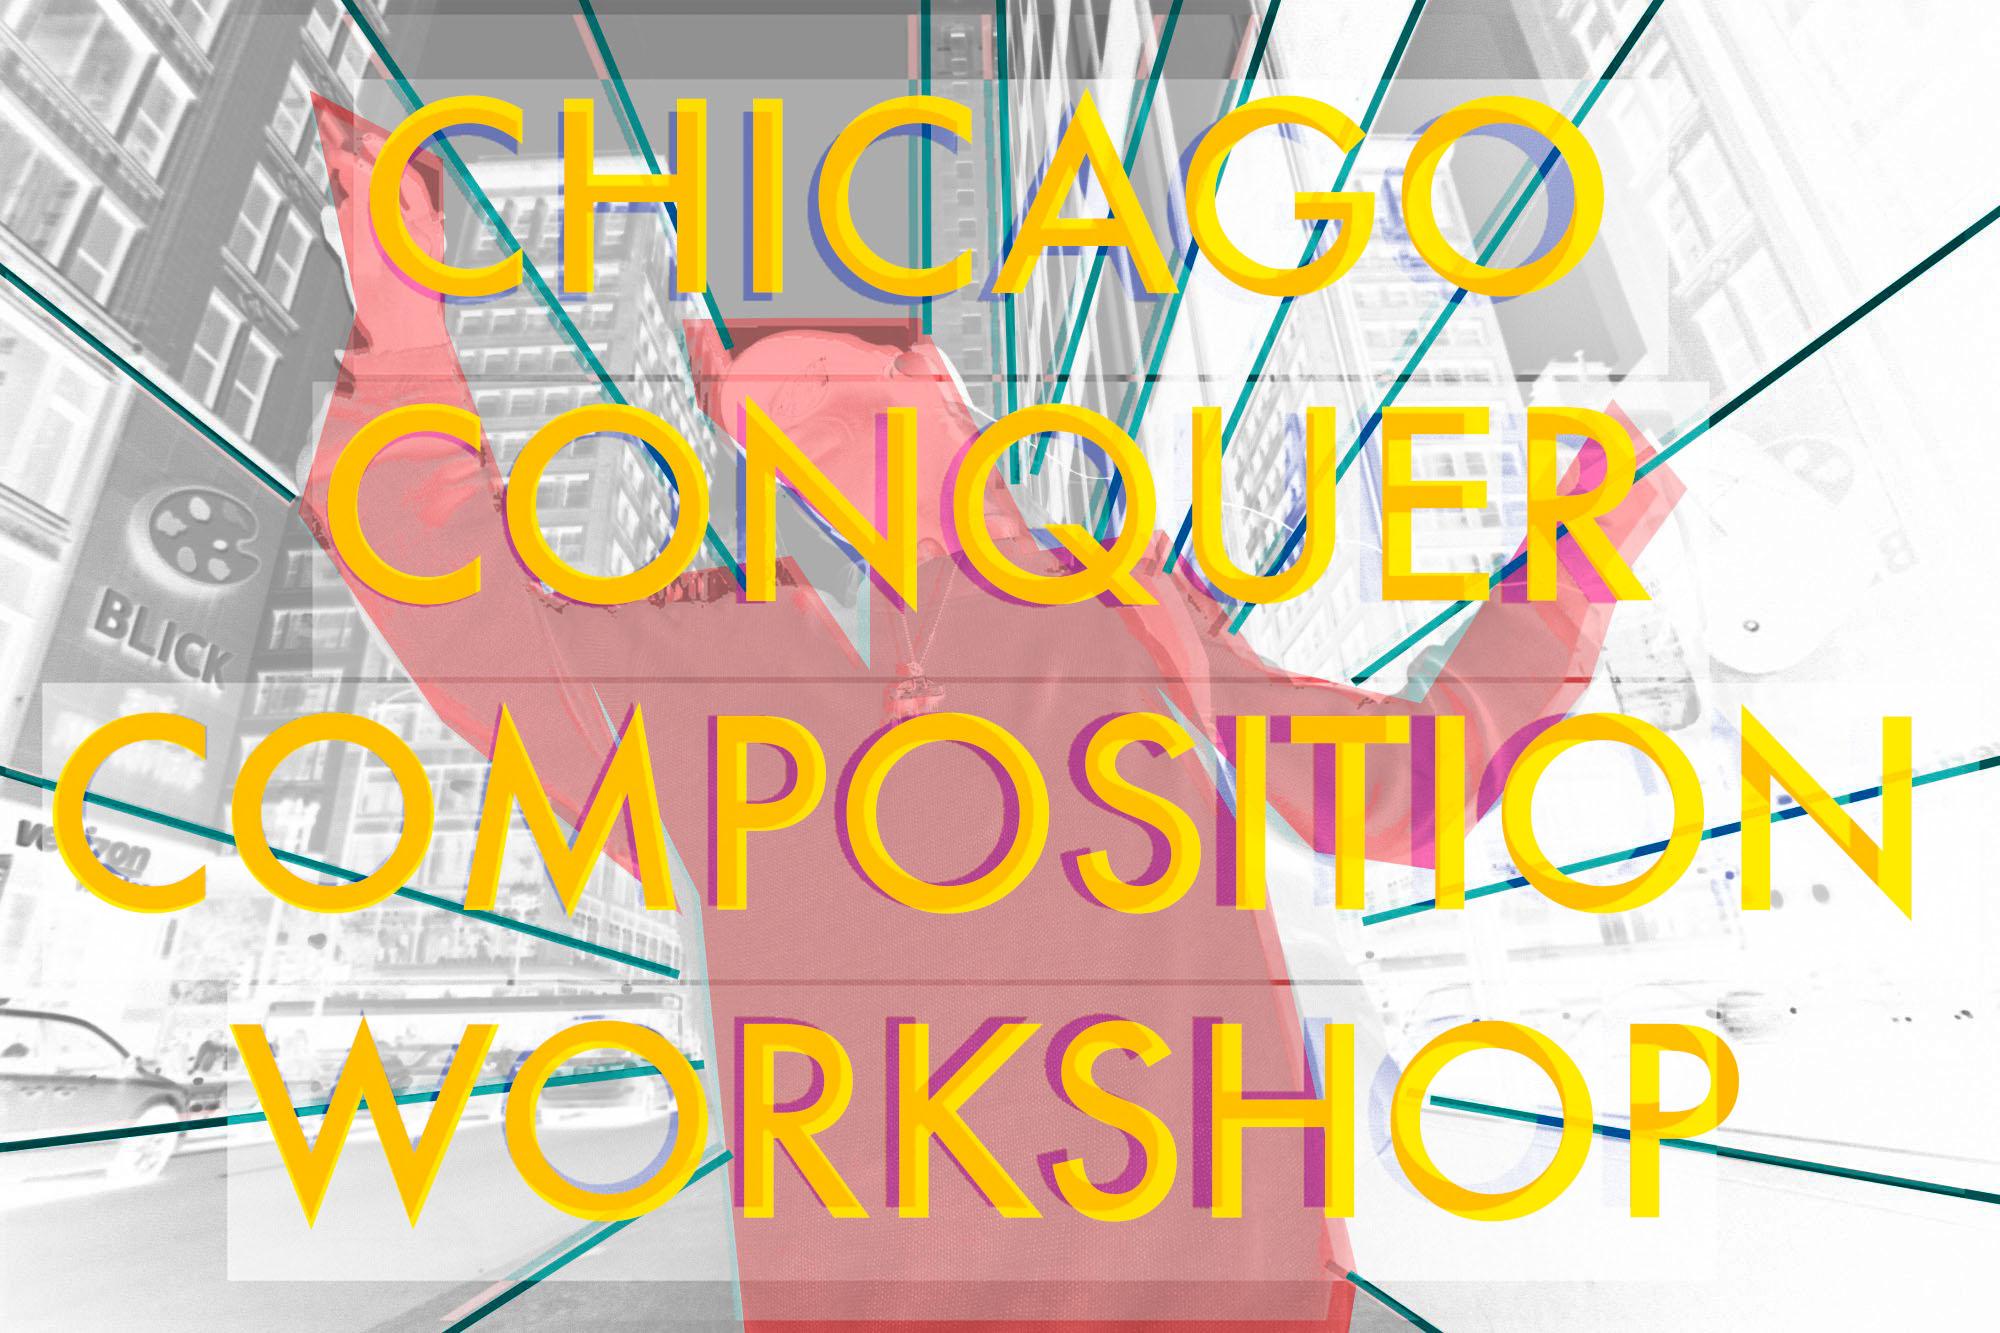 chicago-conquer-composition-workshop-ERIC-KIM-2020-